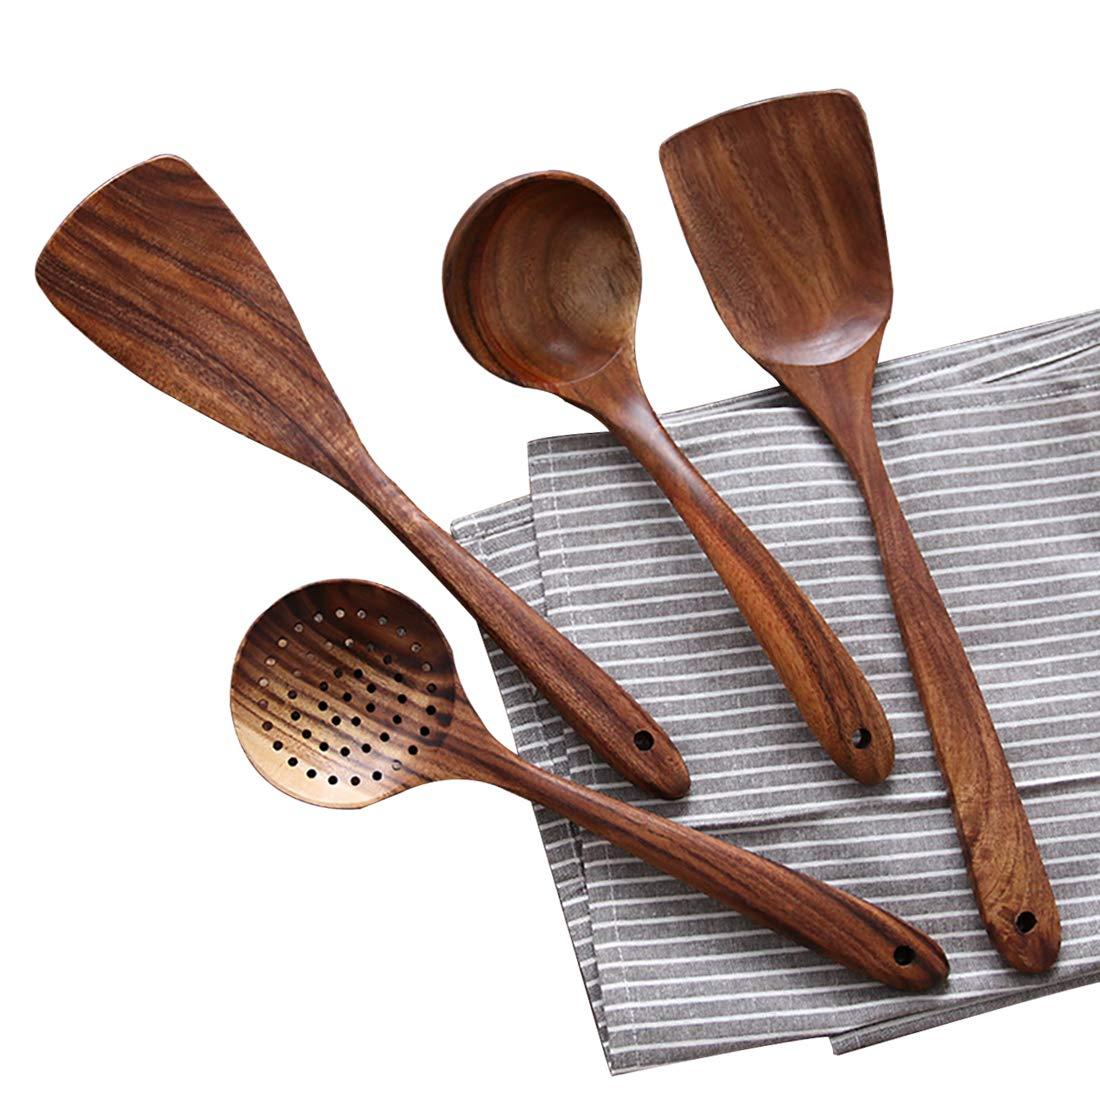 Wooden Cooking Utensils Kitchen Utensil, Natural Teak Wood Kitchen Utensils Set - Nonstick Hard Wooden Spatula and Wooden Spoons (SPOON1) by NAYAHOSE